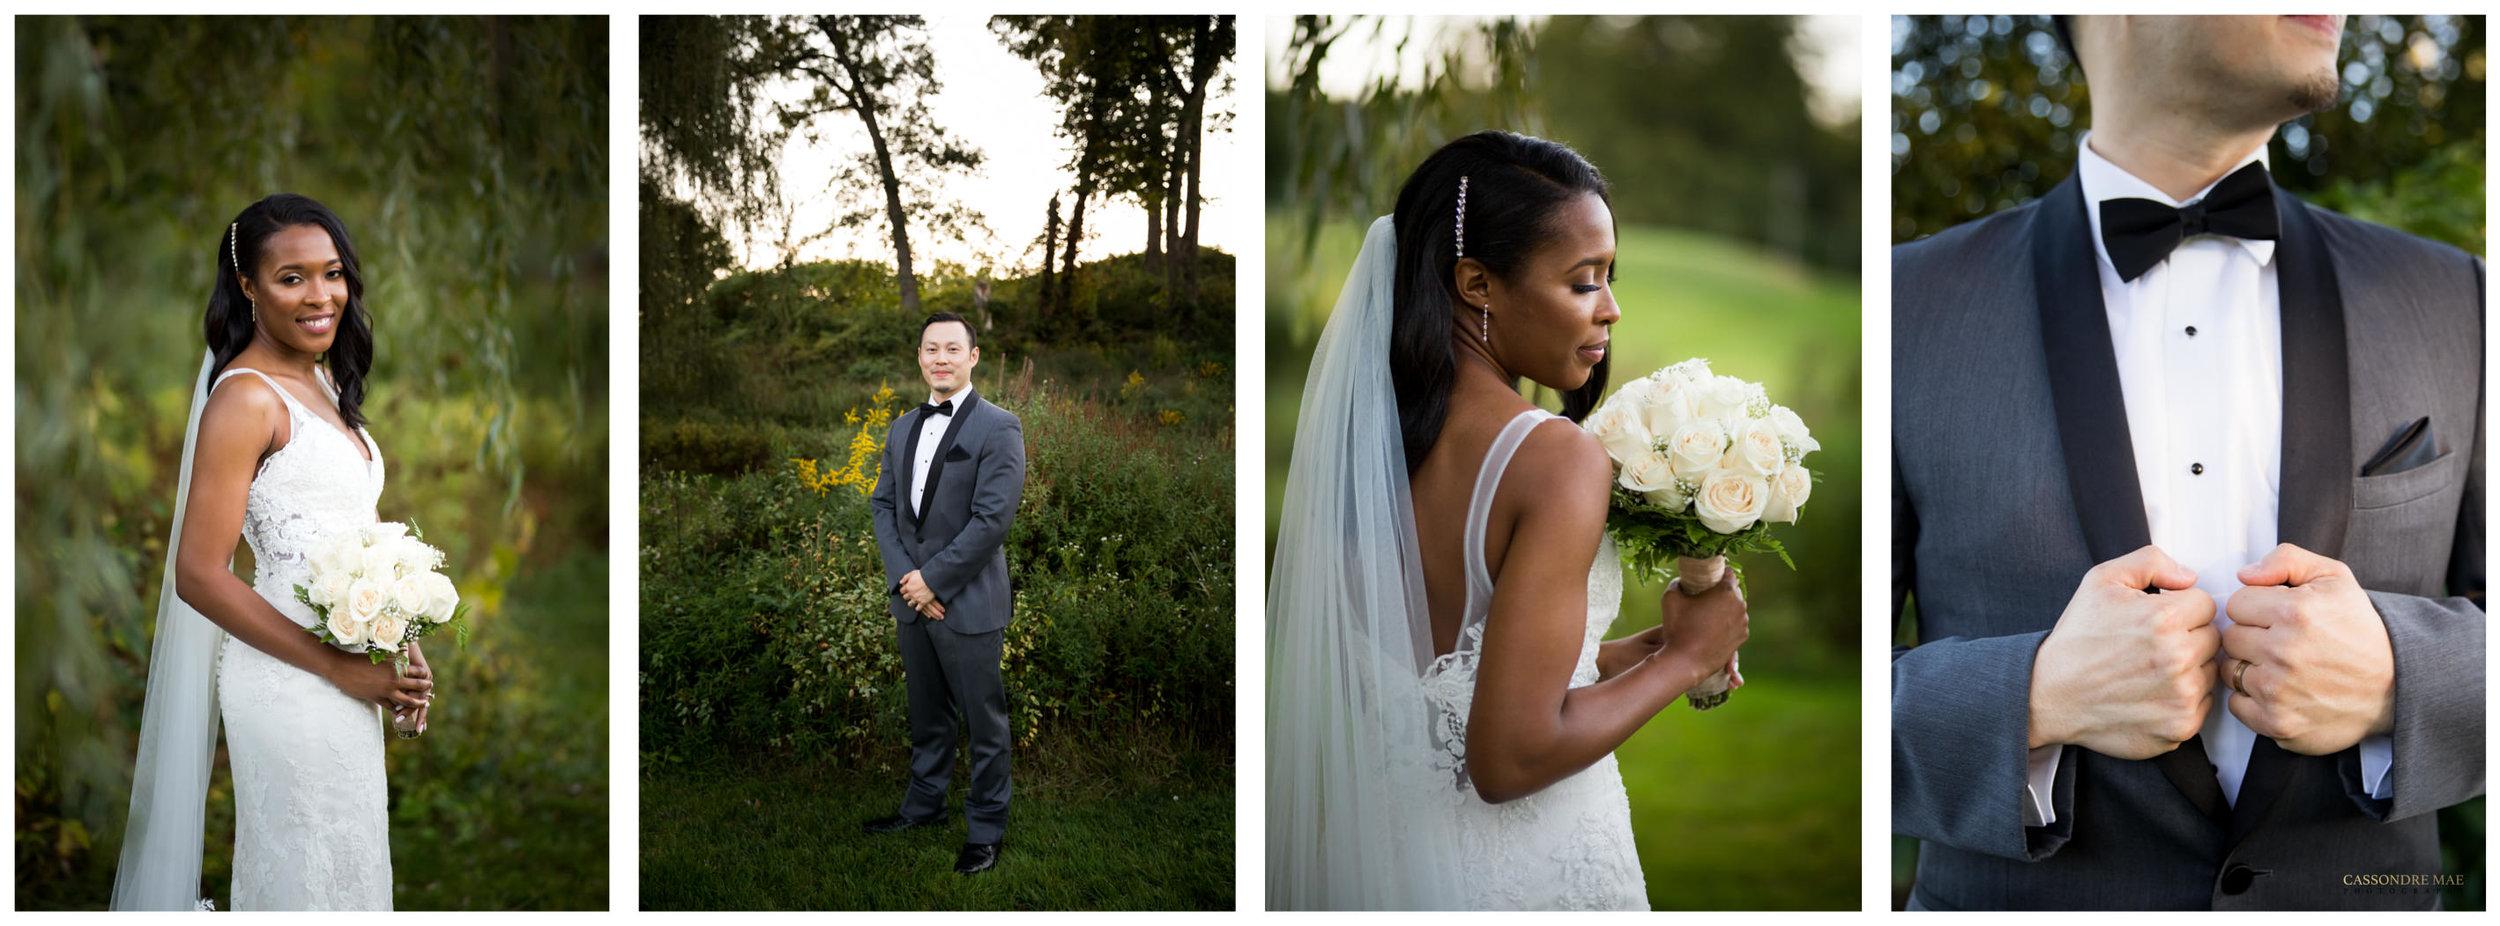 West Hills Country Club Wedding Photos Cassondre Mae Photography 16.jpg